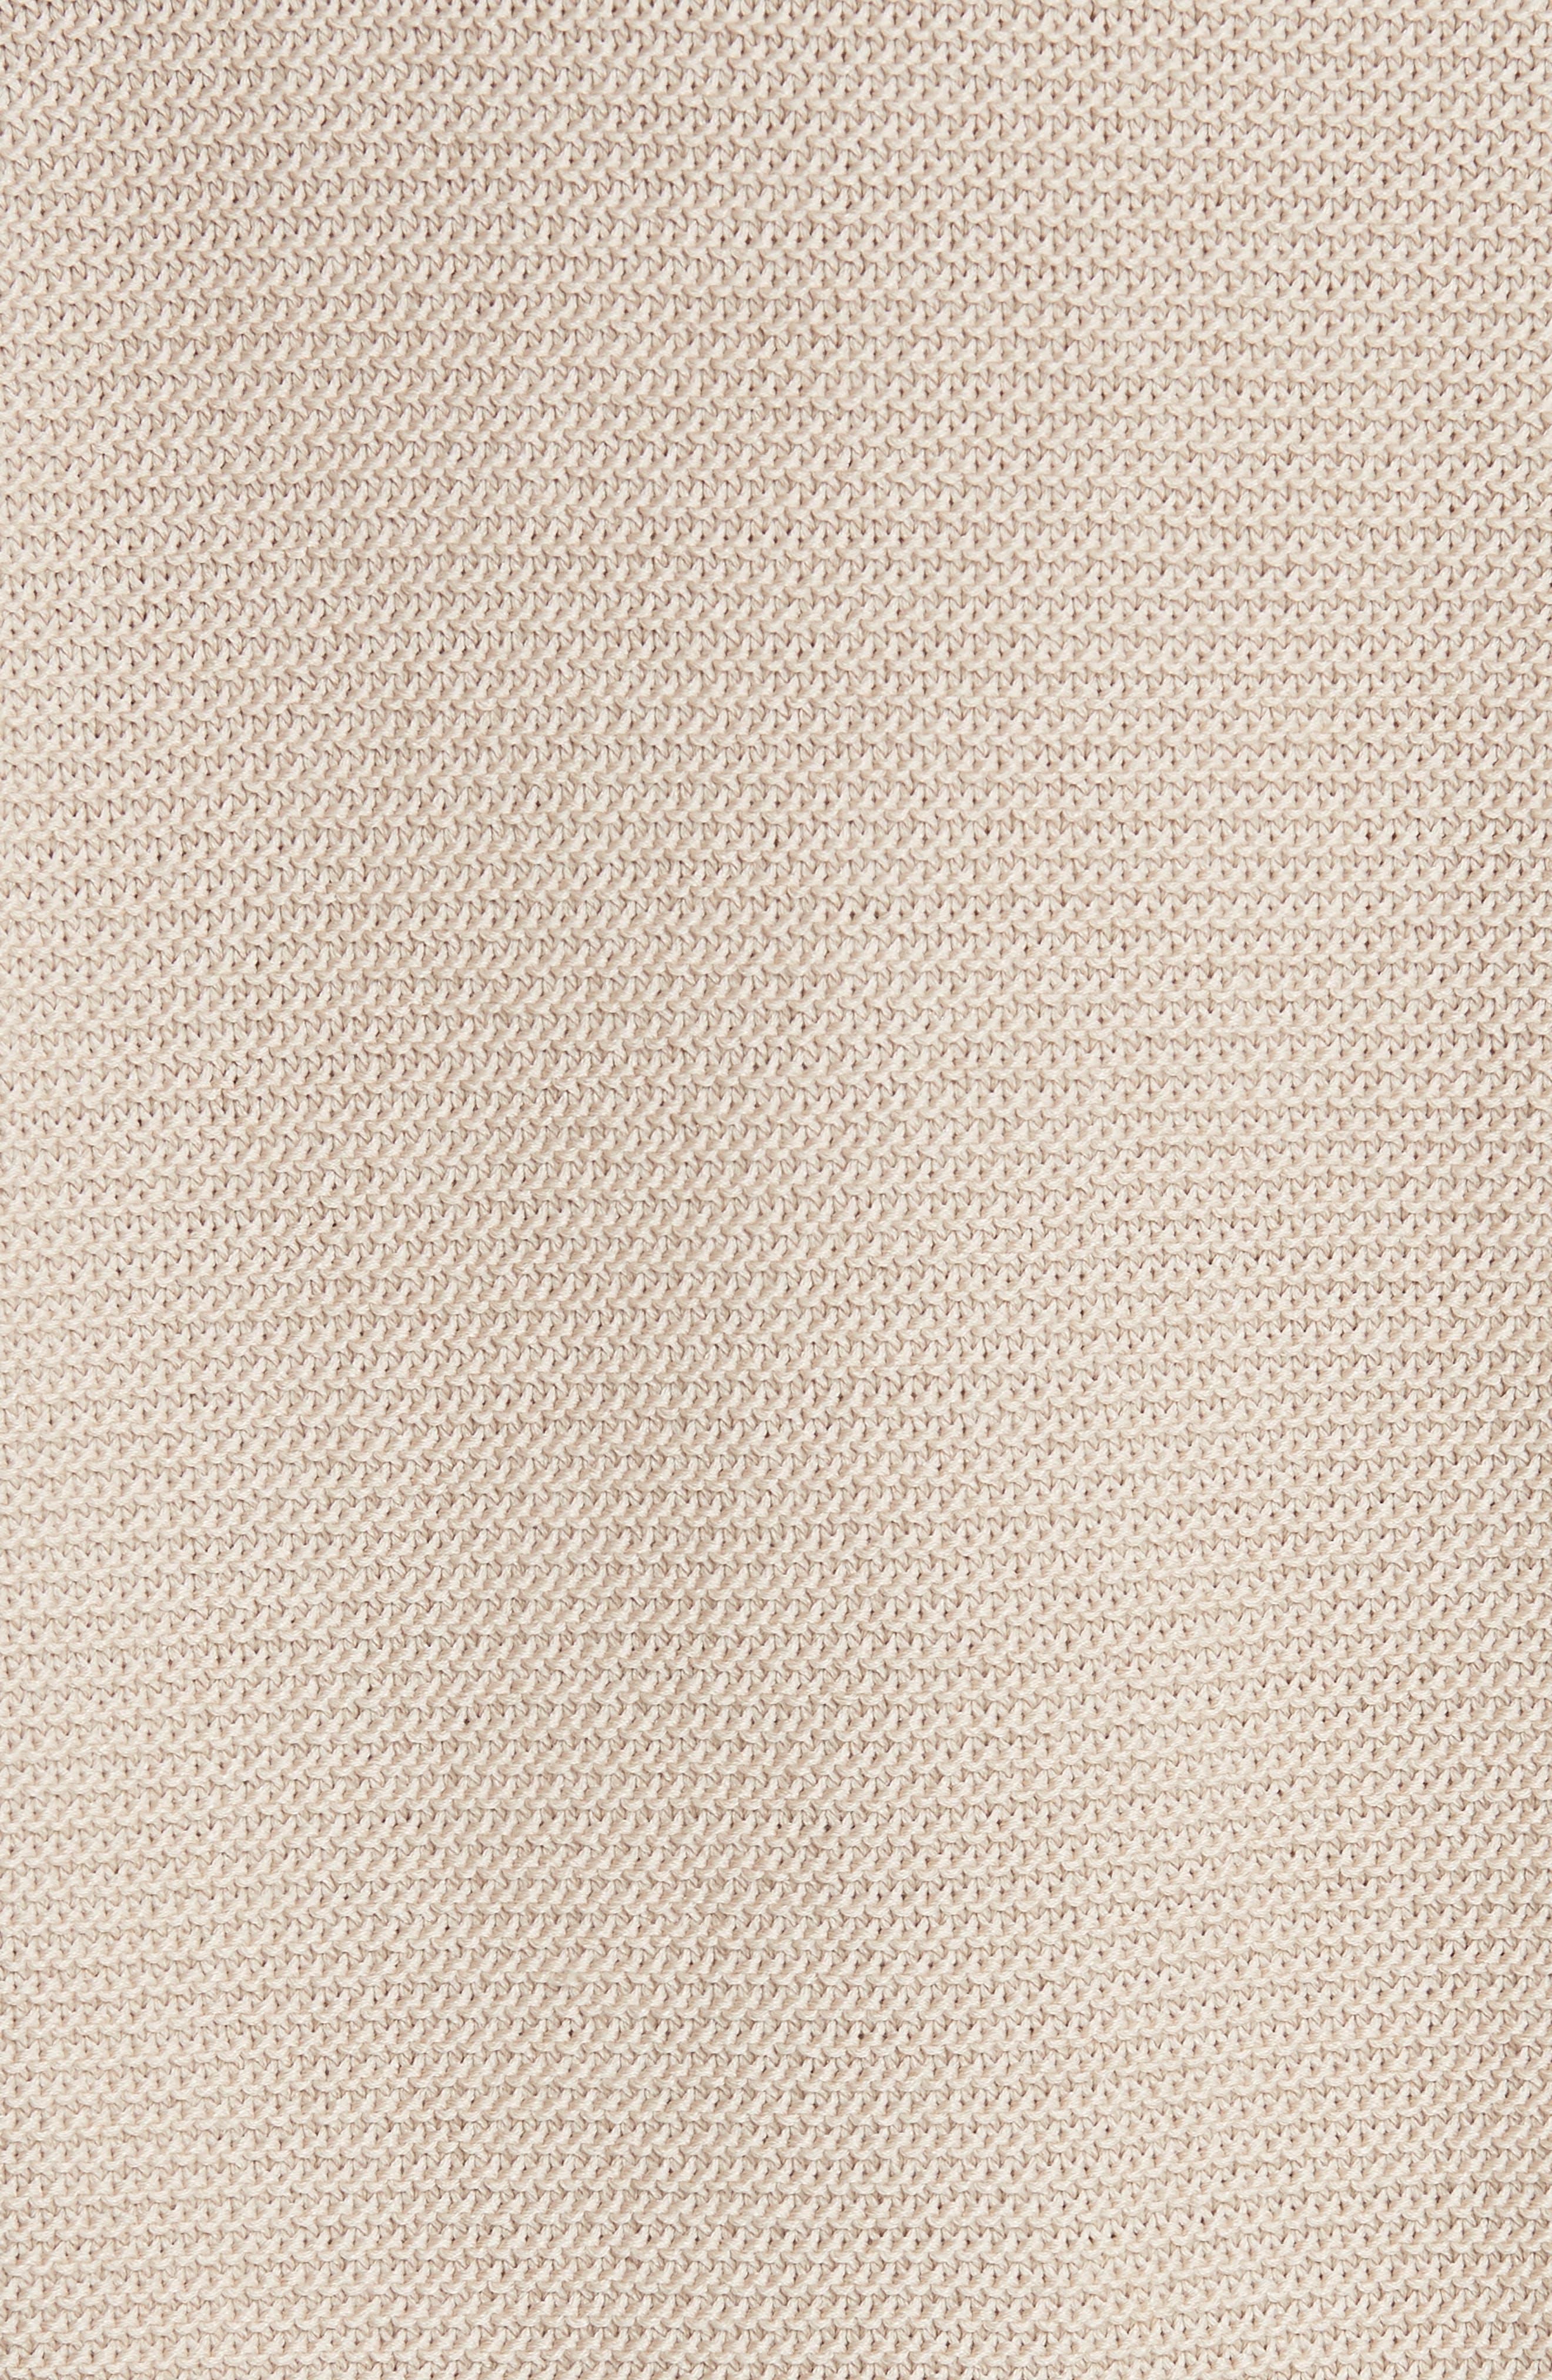 Cotton & Silk Sweater,                             Alternate thumbnail 5, color,                             259